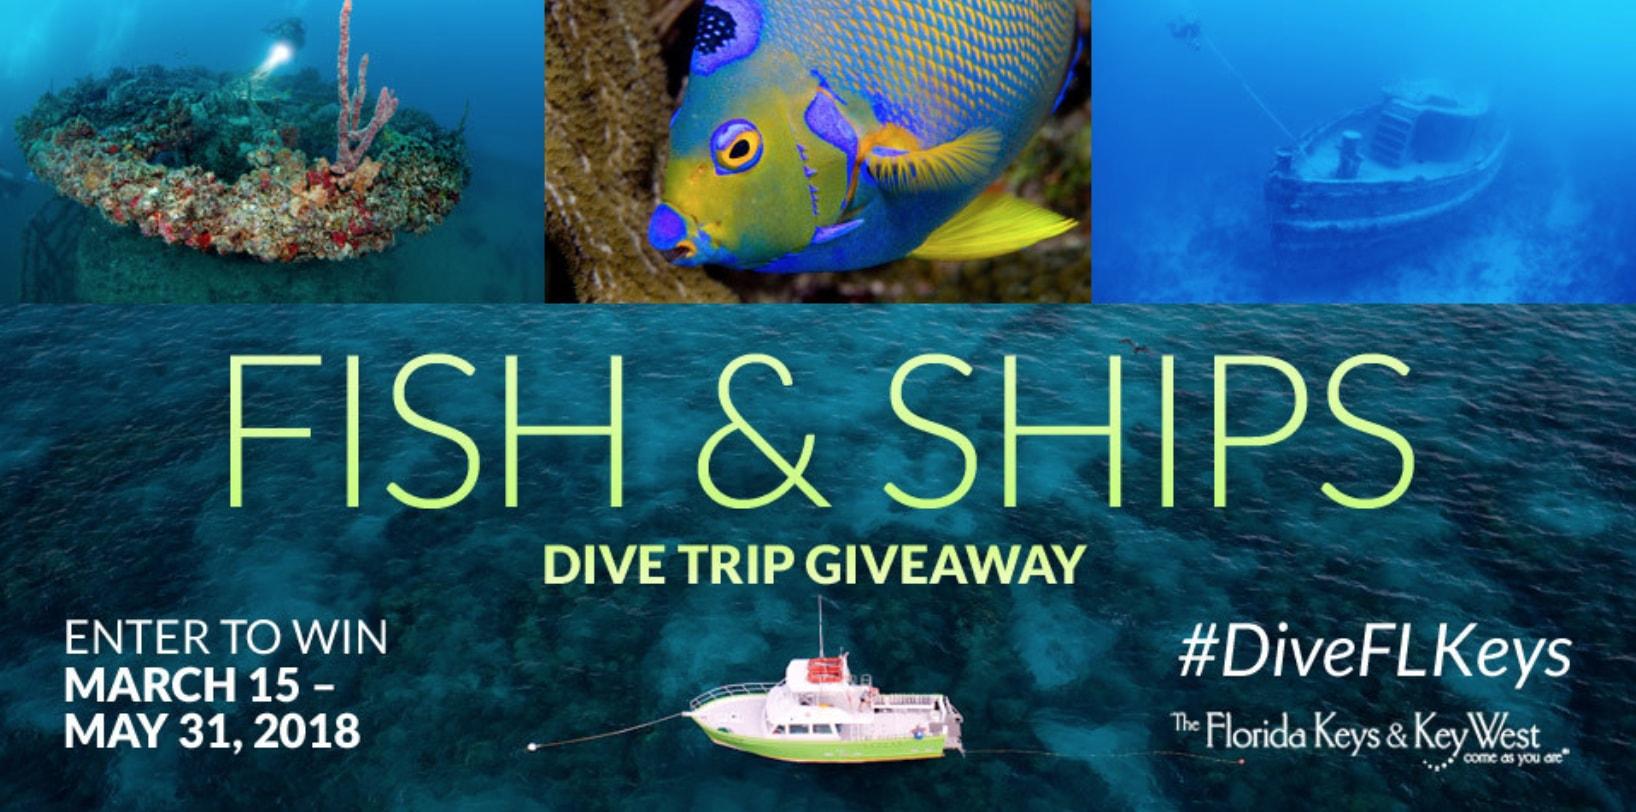 """Fish & Ships"" Dive Trip Giveaway"